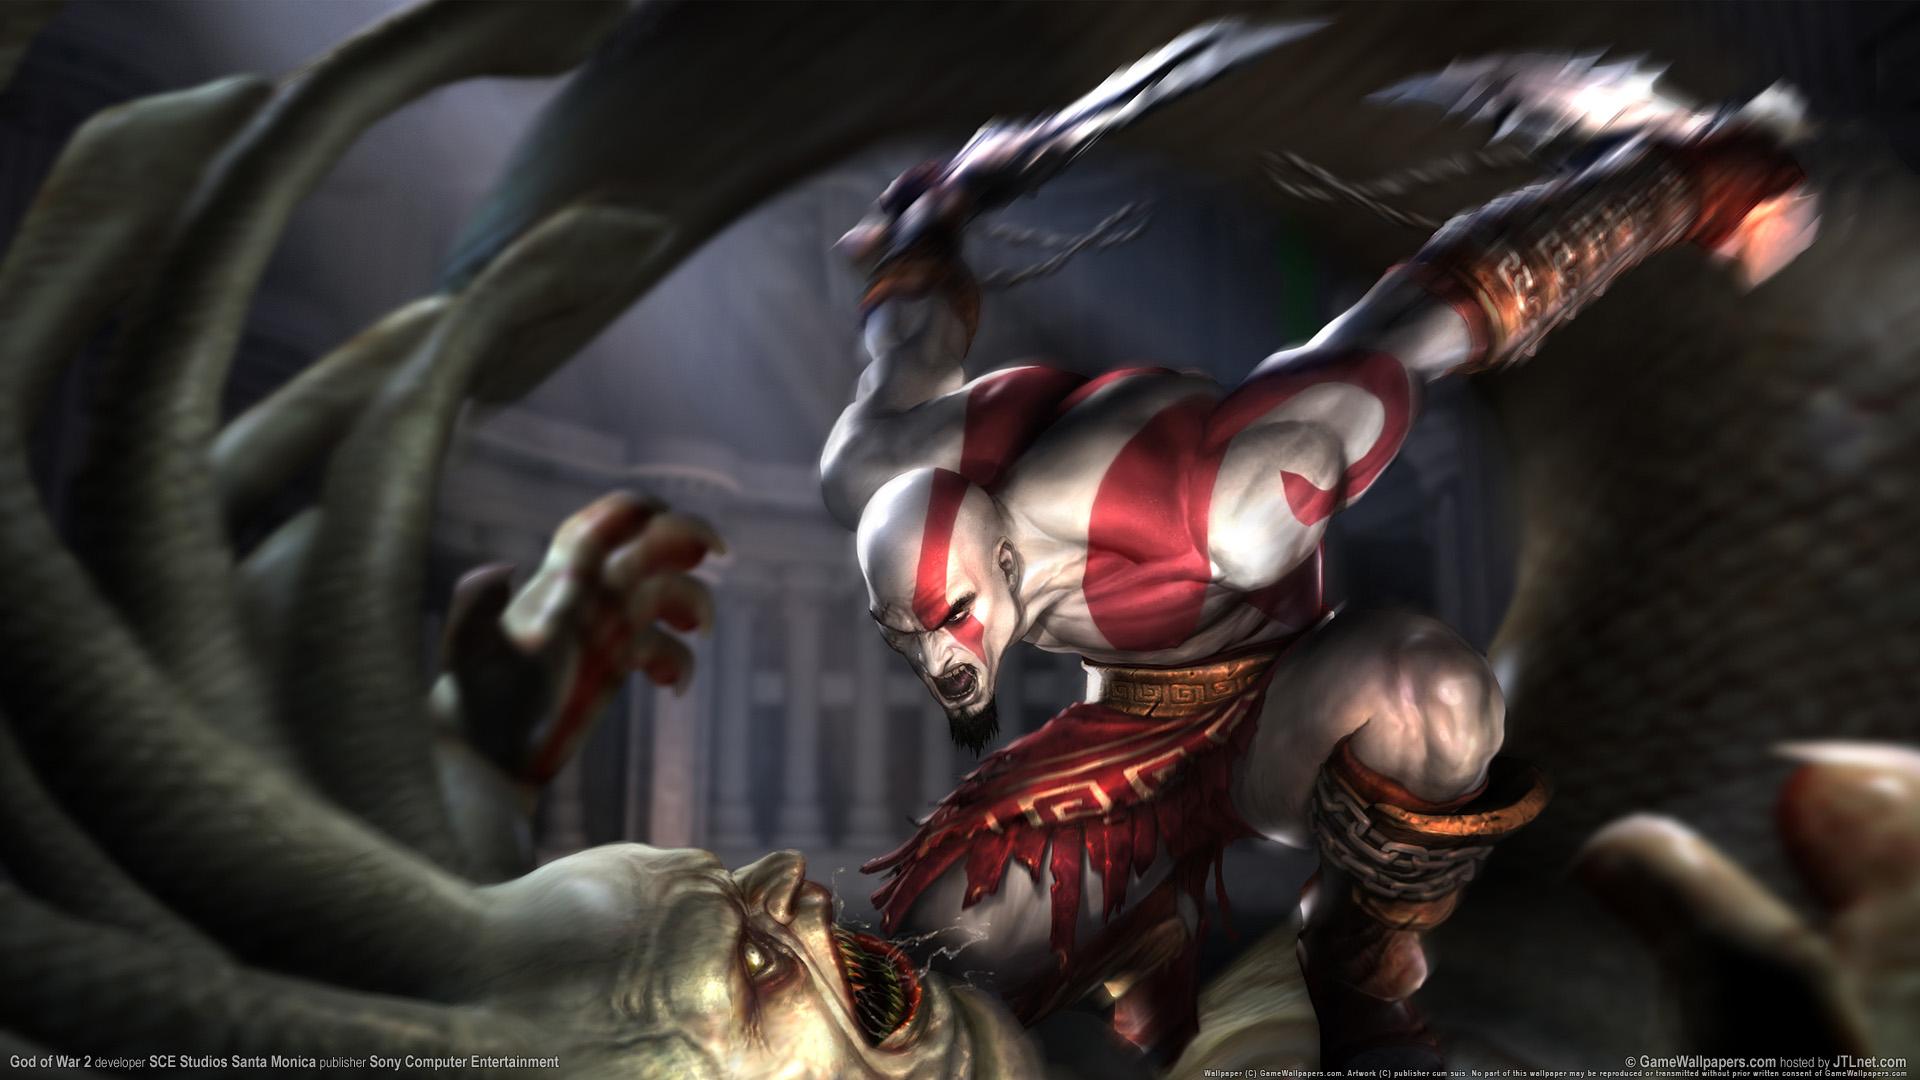 HD Wallpapers God of War 2 1080p